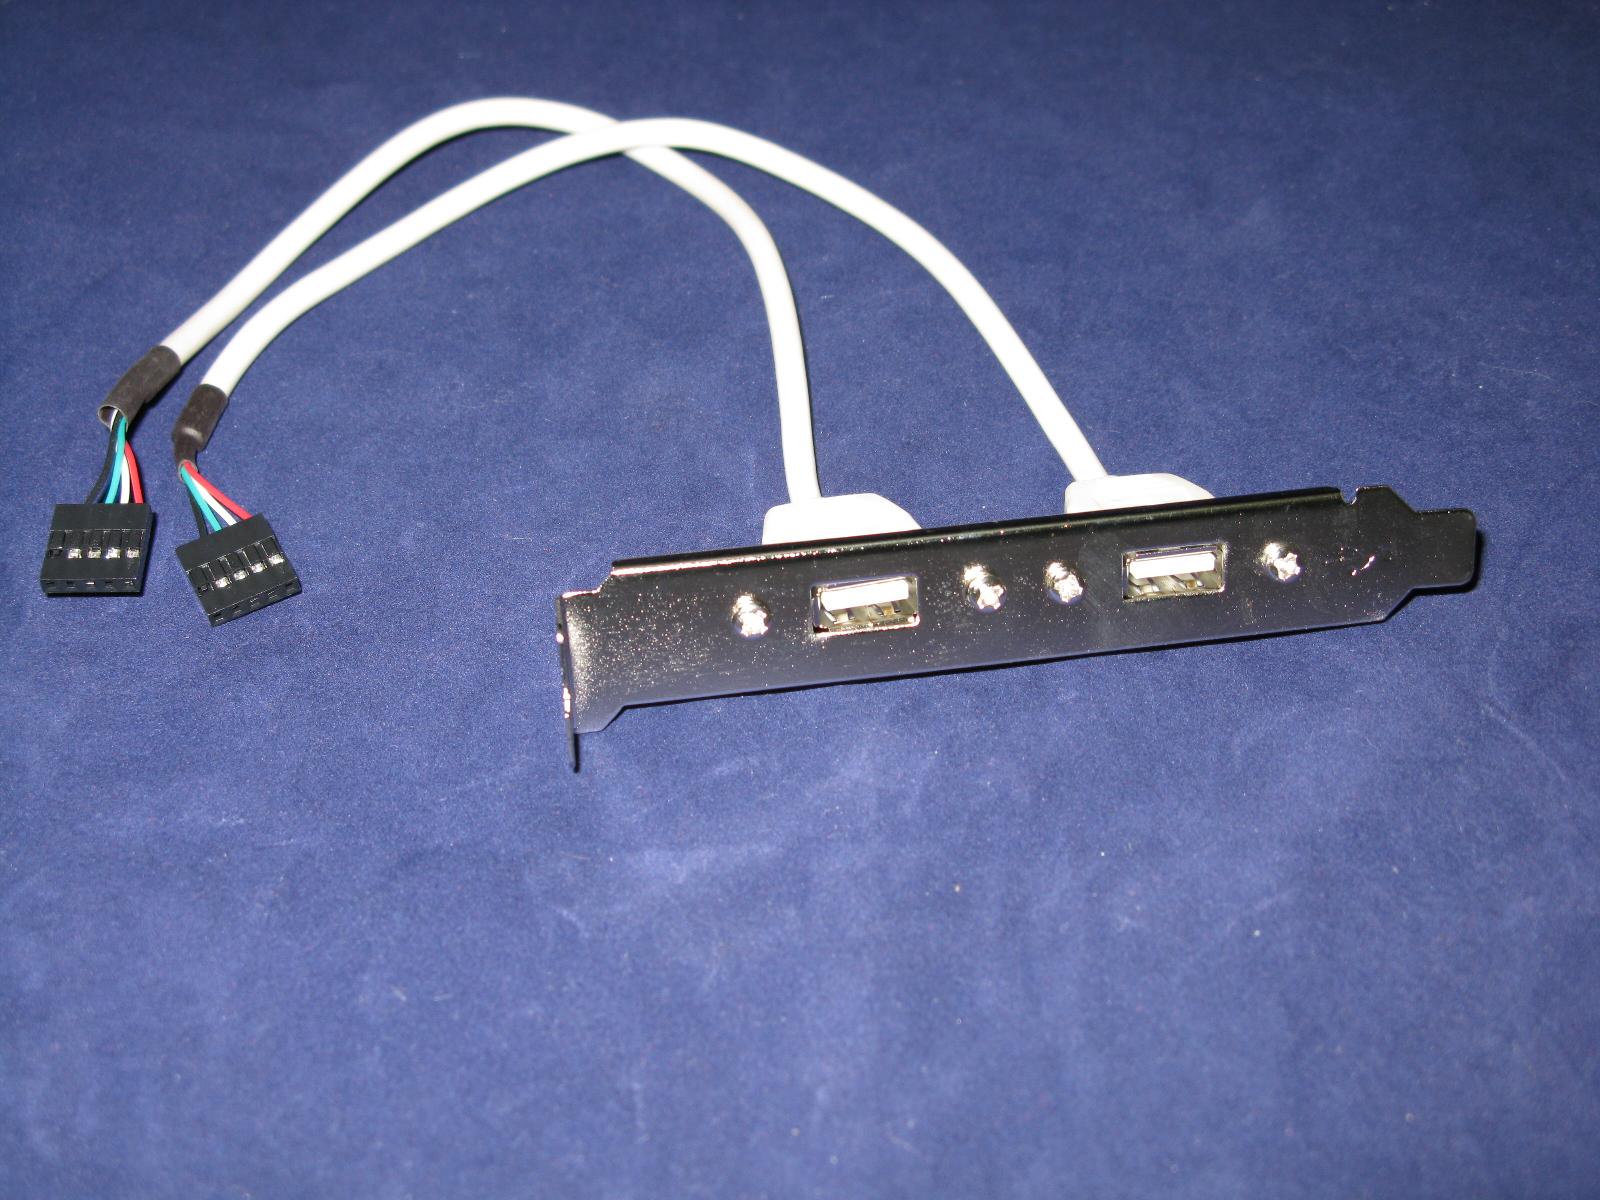 Планка в корпус USB2.0 -2 порта Espada EBRCT-2PrtUSB2 (10pin/9pin to usb2.0 переходник) цена и фото